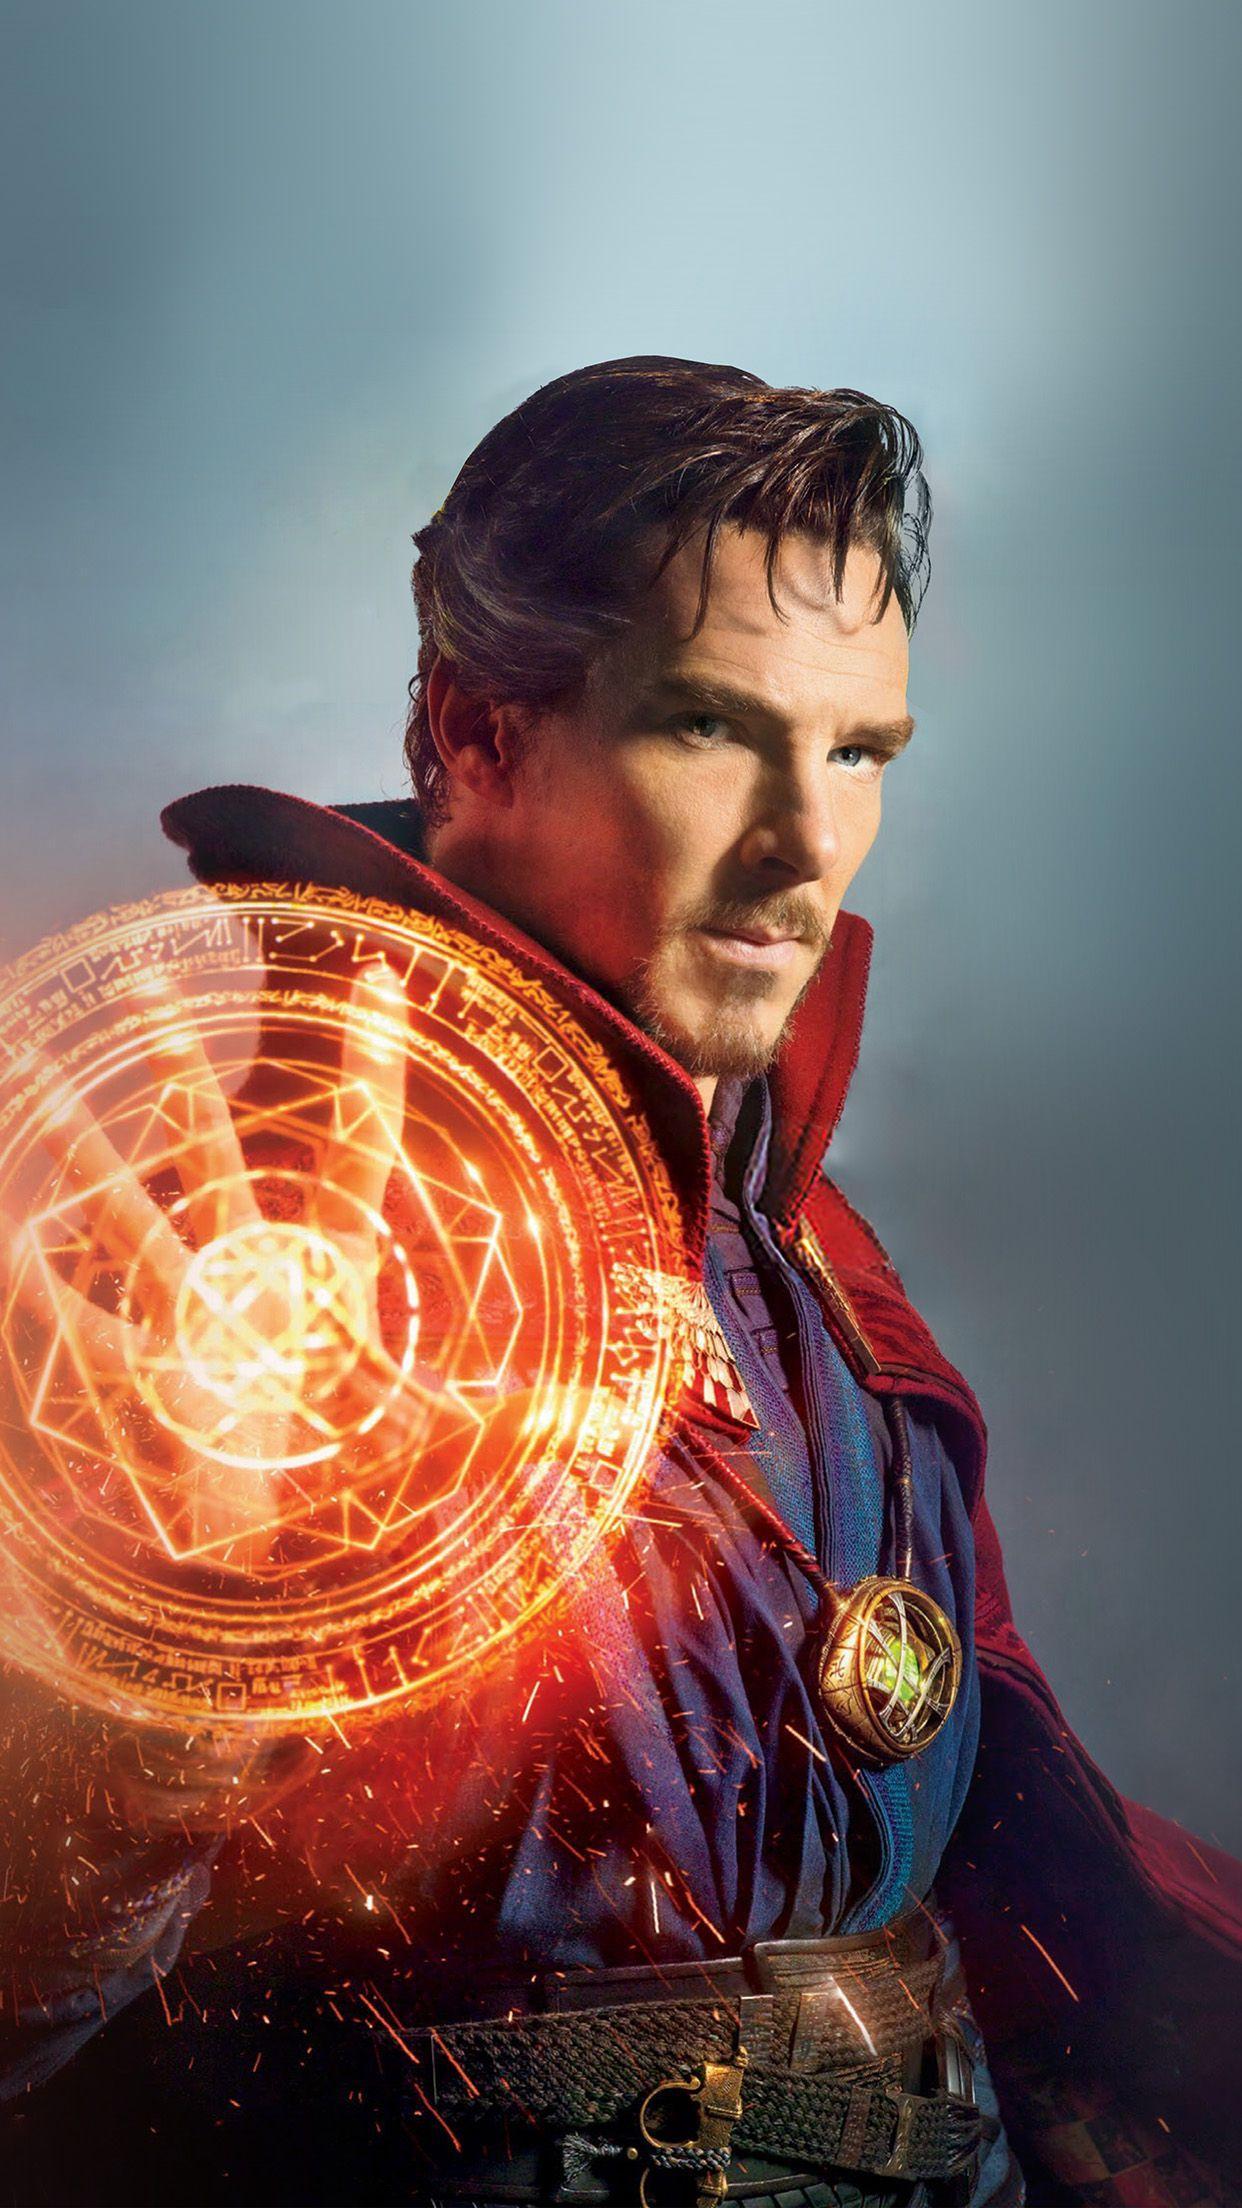 doctor strange full movie hd 1080p download